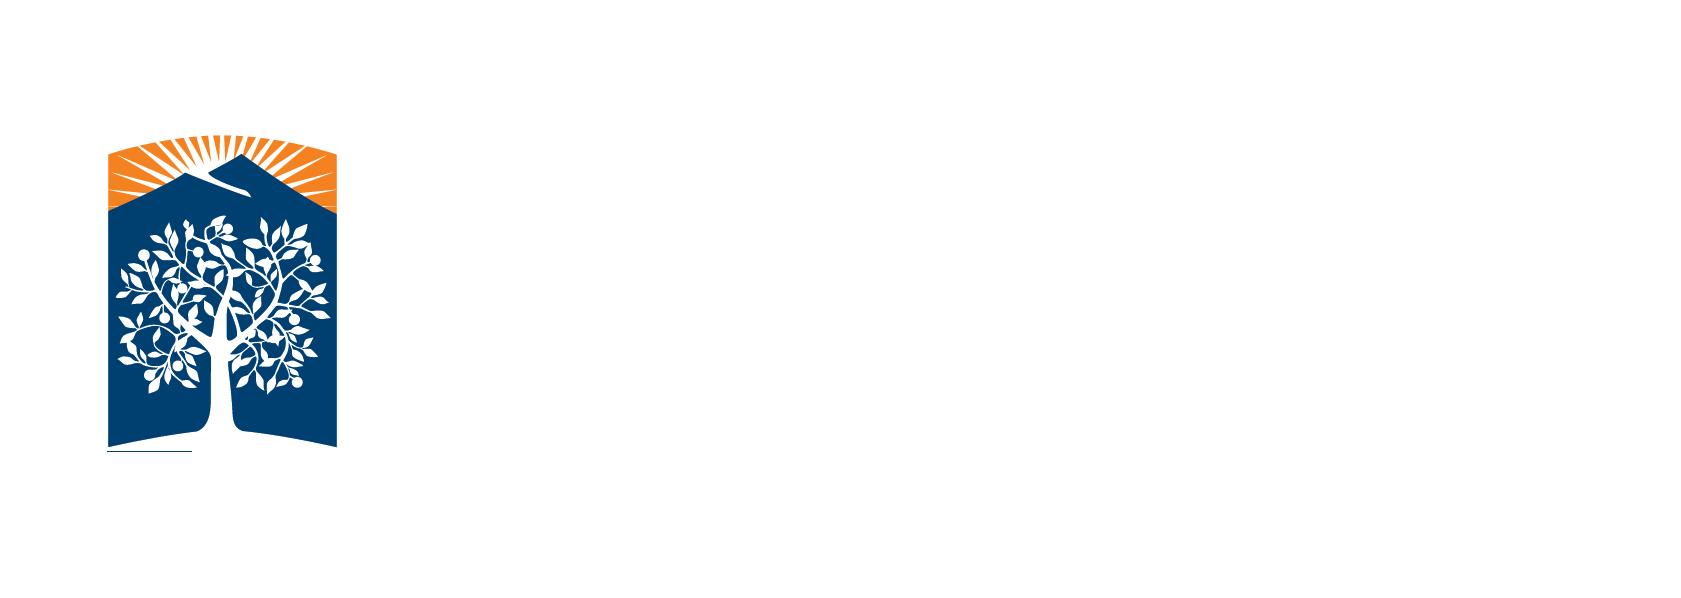 Csuf Academic Calendar 2022.Academic Calendar California State University Fullerton Acalog Acms